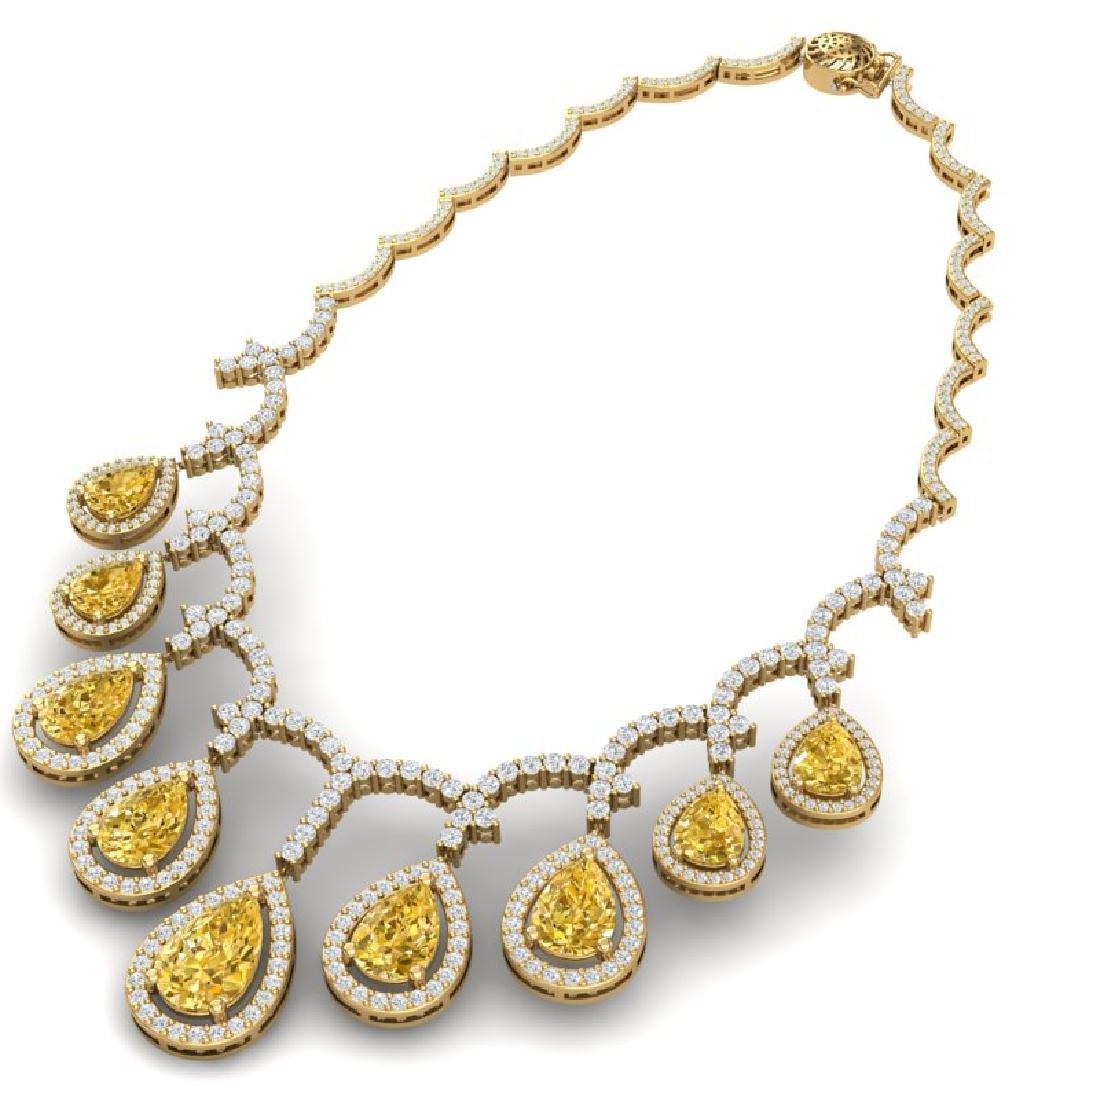 29.42 CTW Royalty Canary Citrine & VS Diamond Necklace - 3